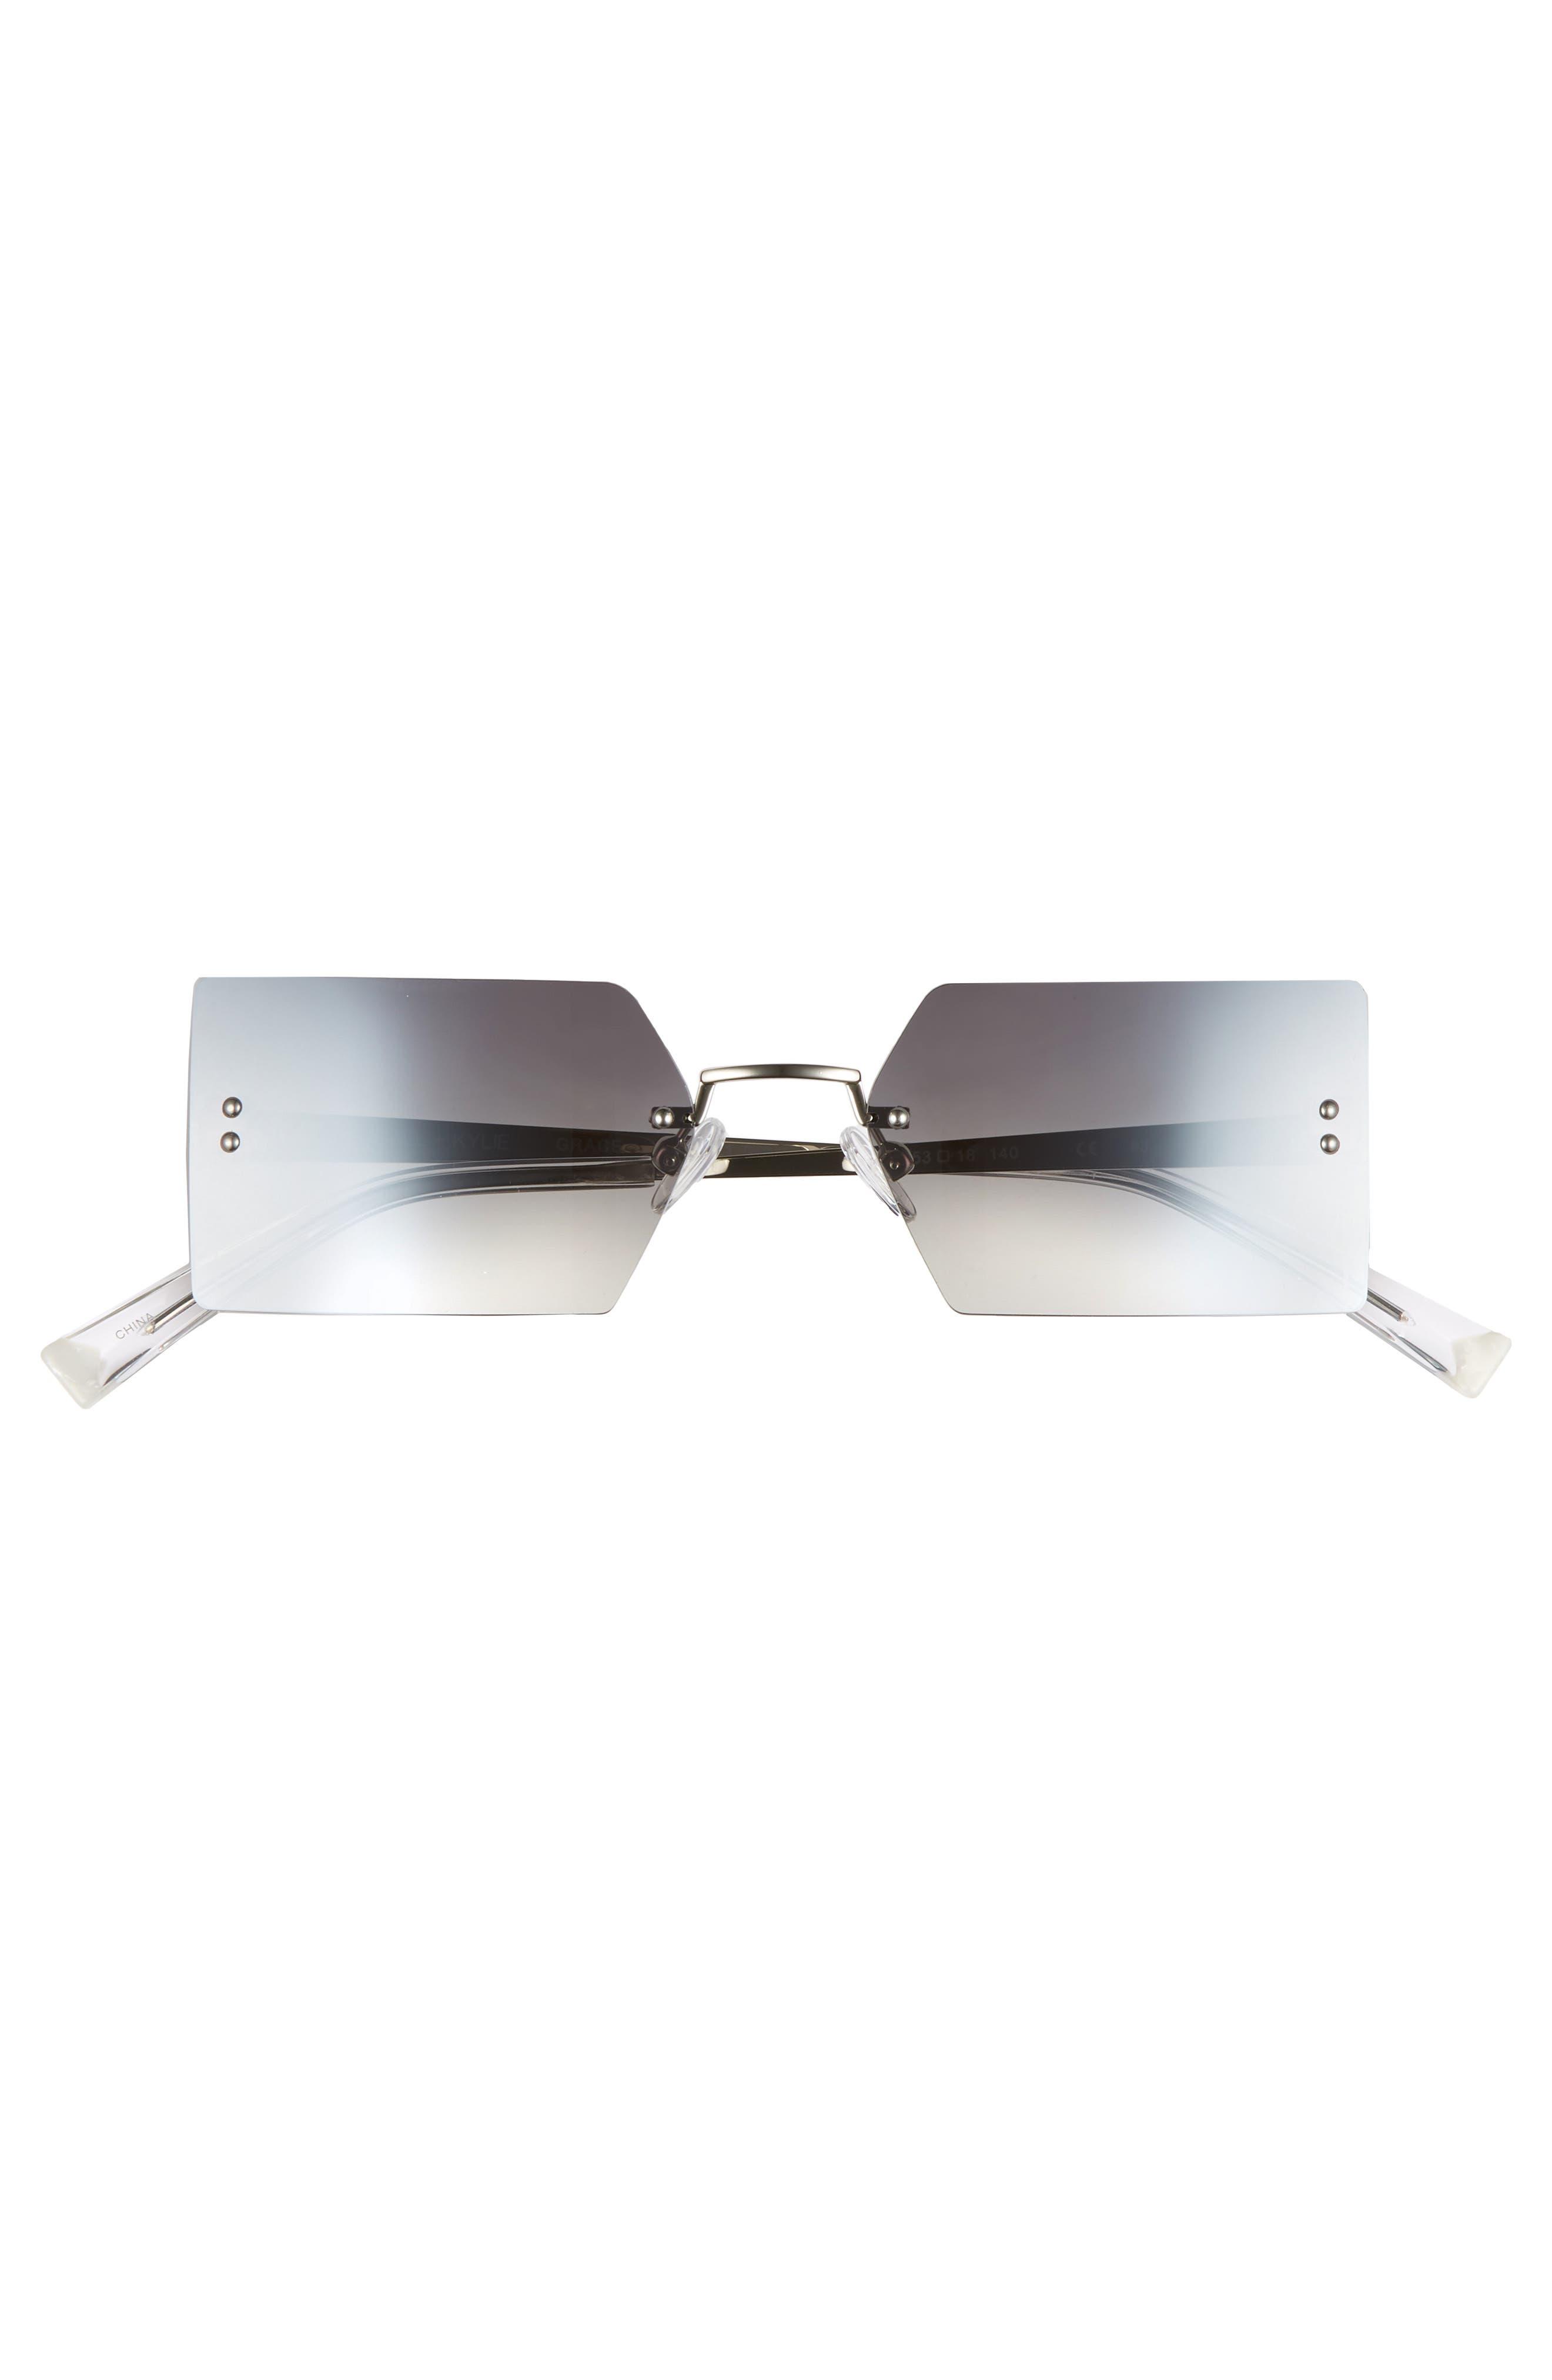 Grace 53mm Rimless Rectangular Sunglasses,                             Alternate thumbnail 3, color,                             Silver/ Smoke Gradient Flash